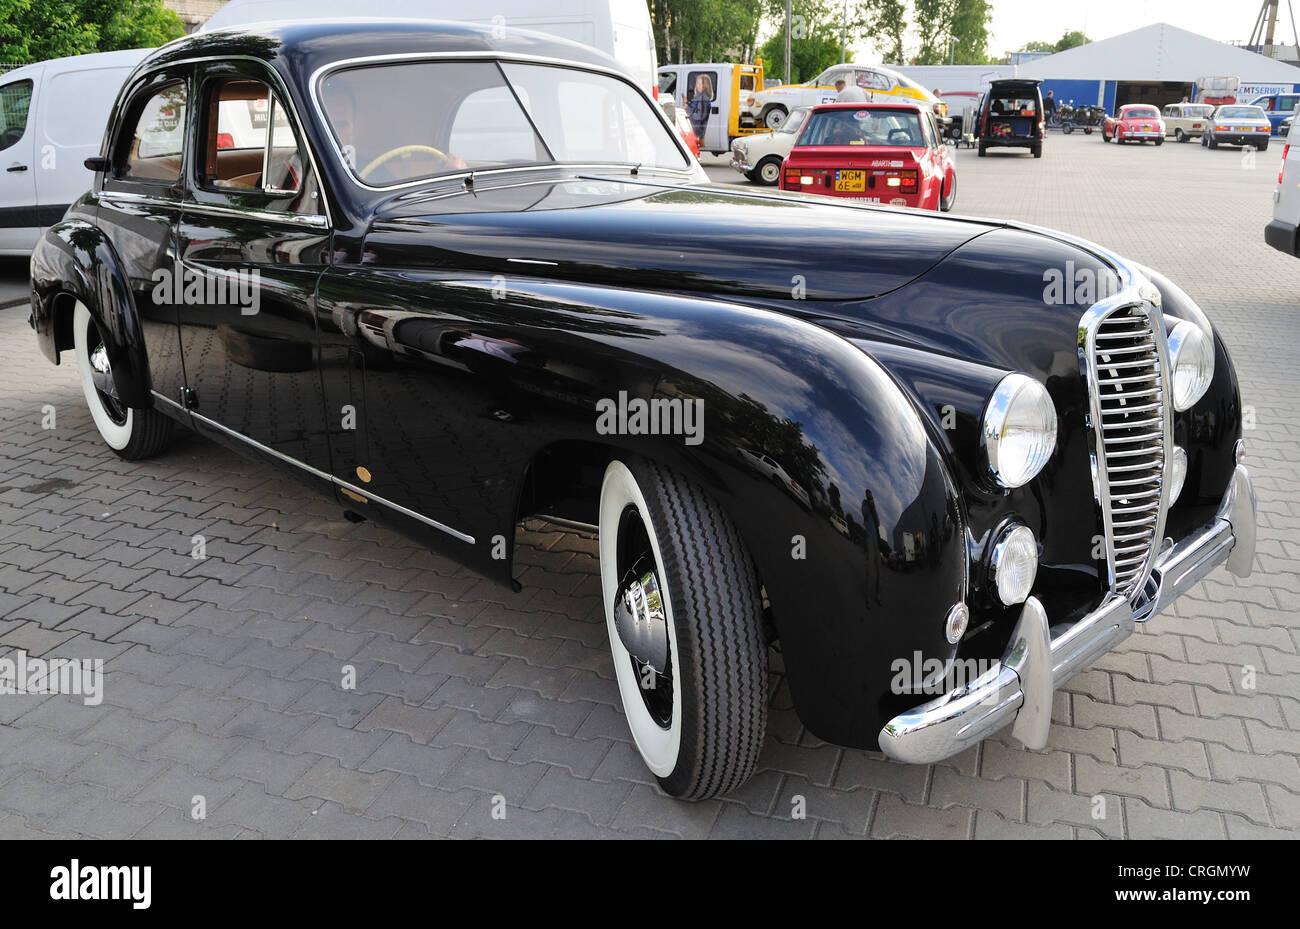 Vintage limousine - Delahaye - Stock Image